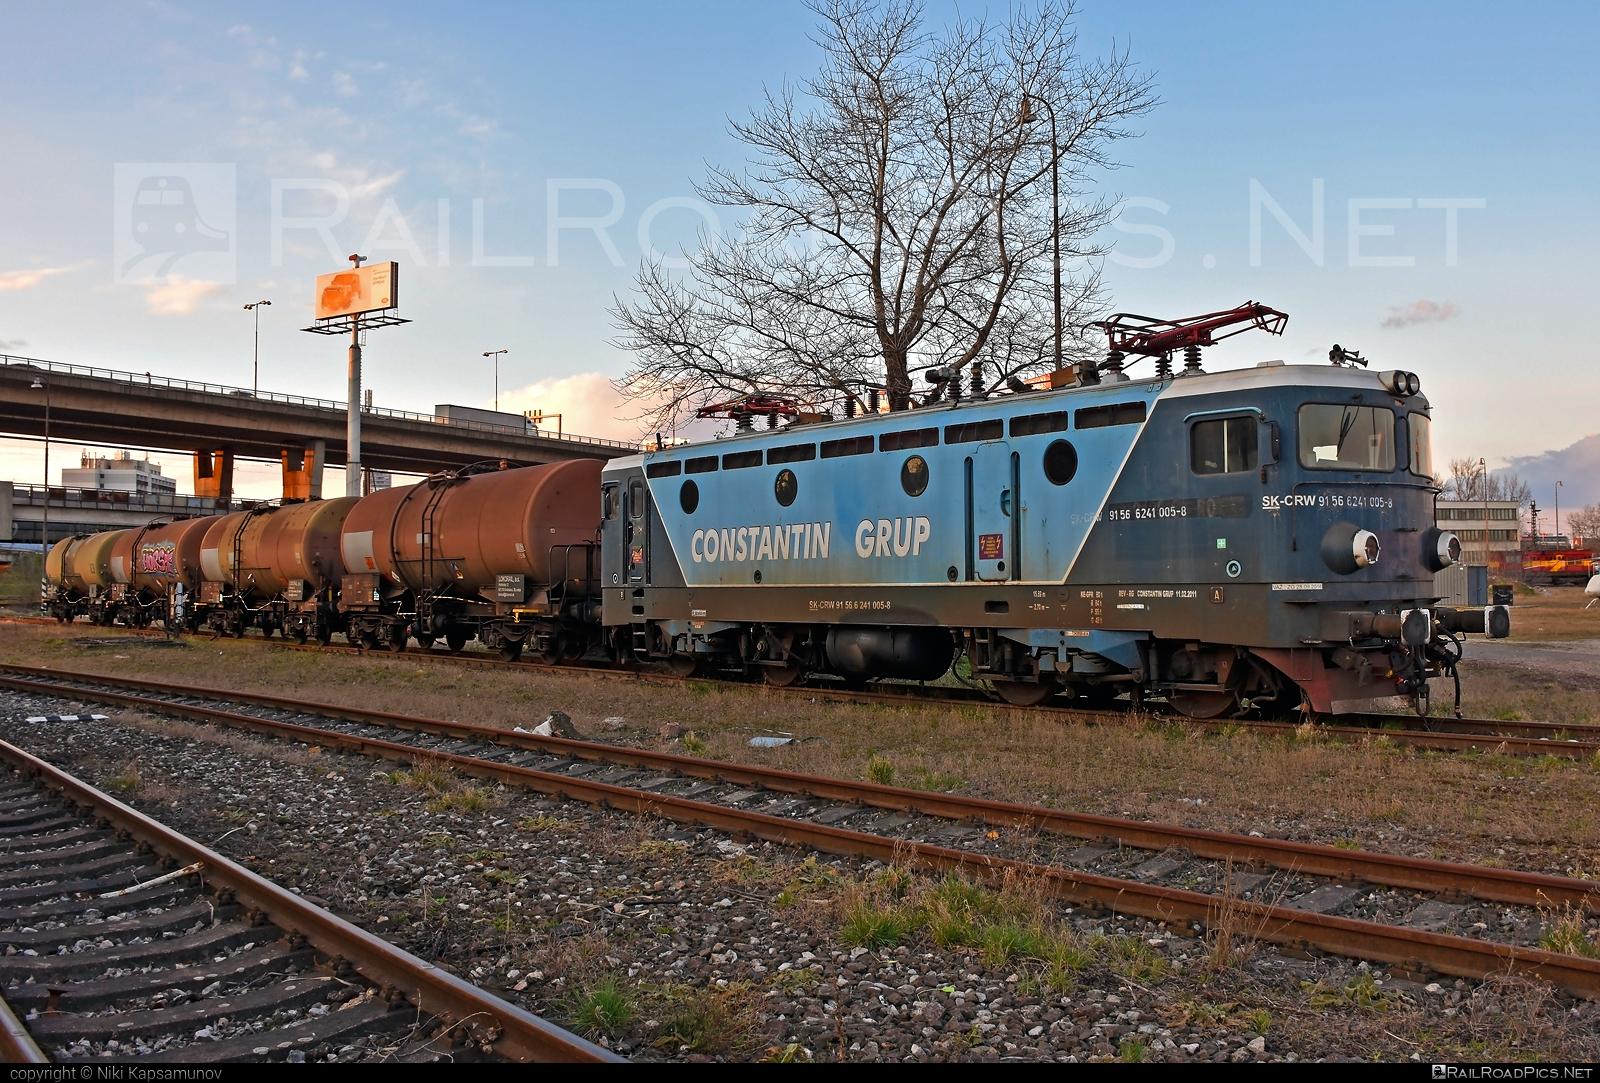 Končar JŽ class 441 - 241 005-8 operated by CENTRAL RAILWAYS s.r.o. #centralrailways #constantingrup #crw #jz441 #kesselwagen #koncar #koncar441 #tankwagon